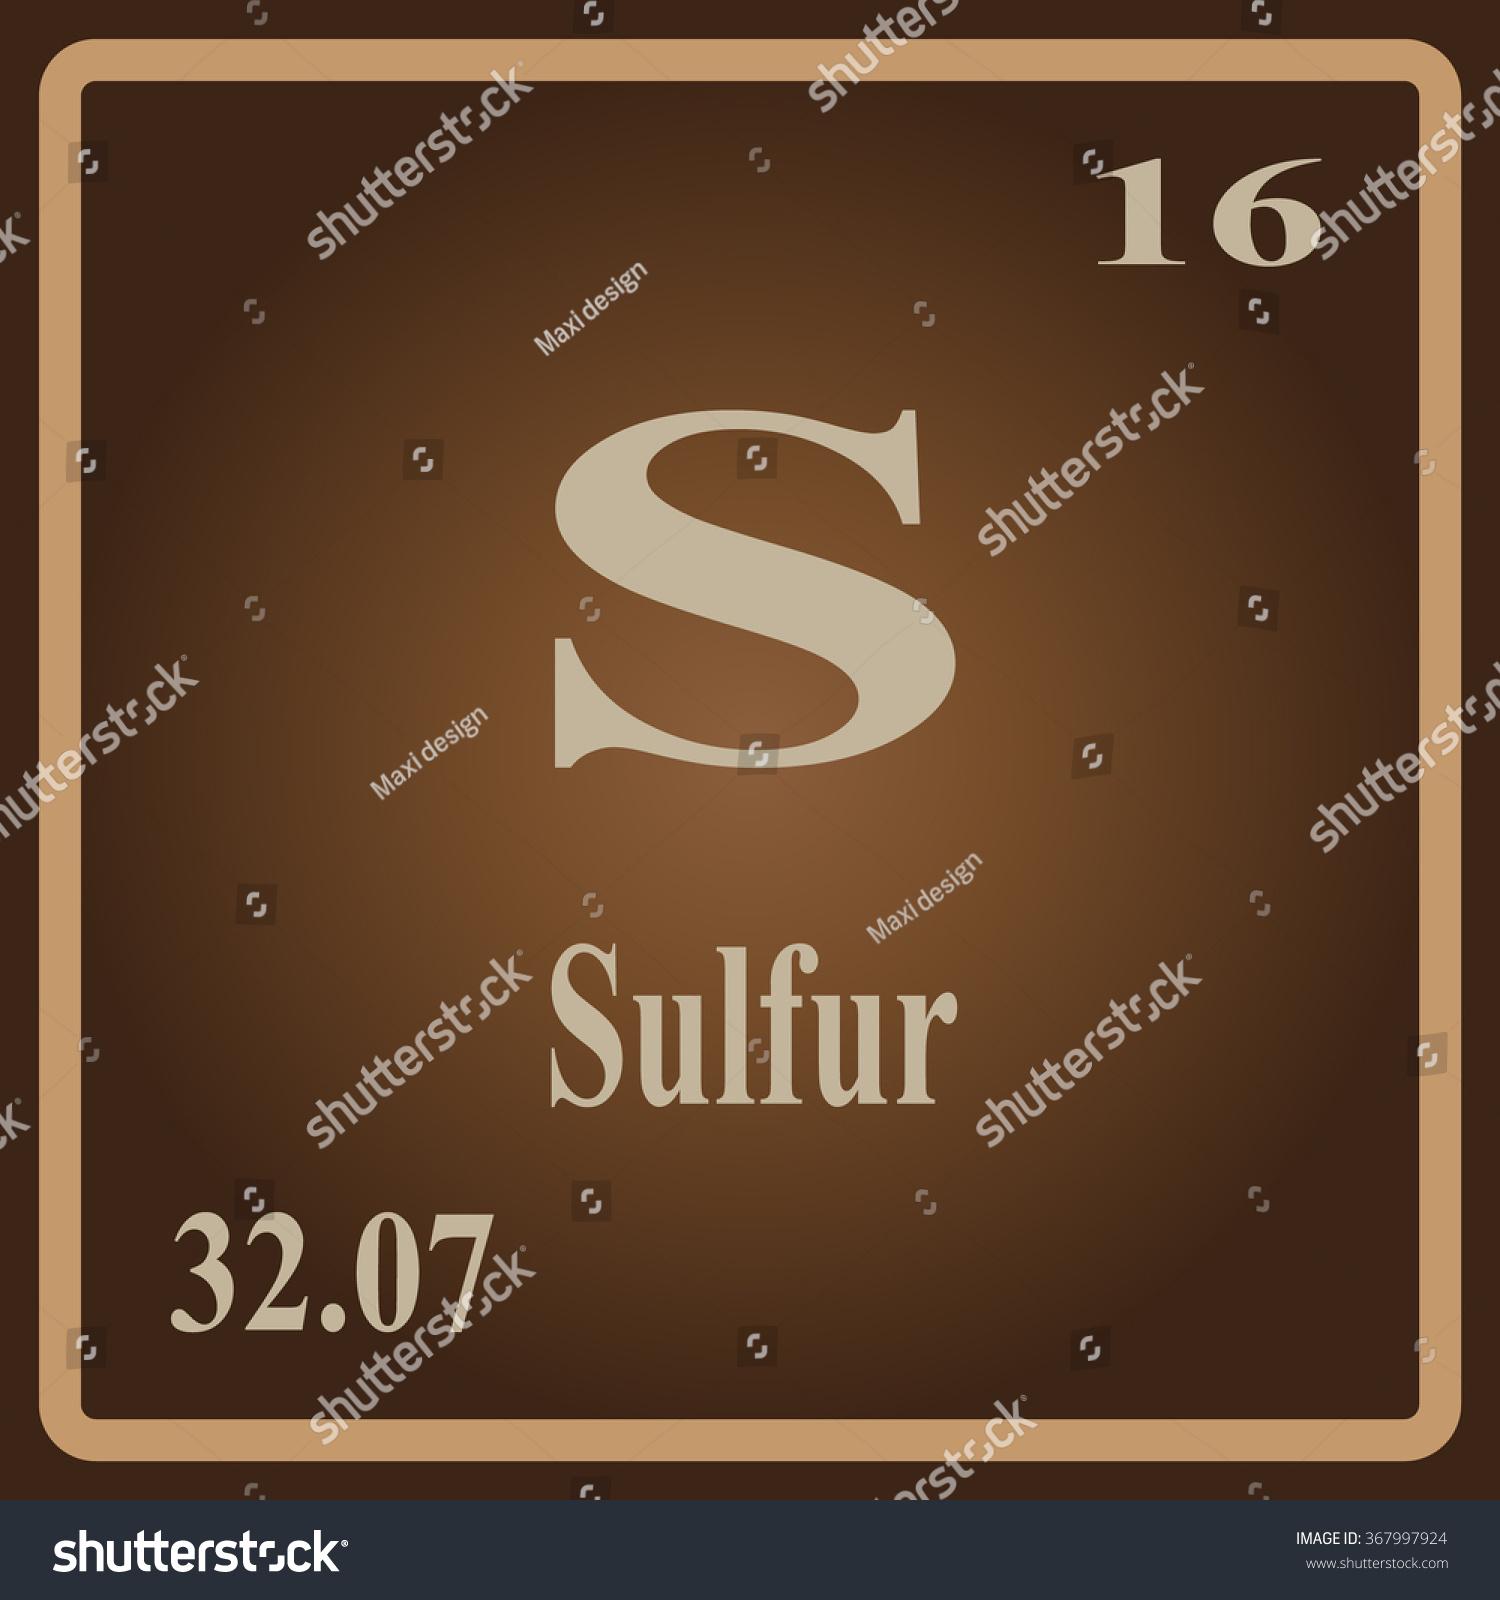 Periodic table elements sulfur stock vector 367997924 shutterstock the periodic table of the elements sulfur gamestrikefo Gallery